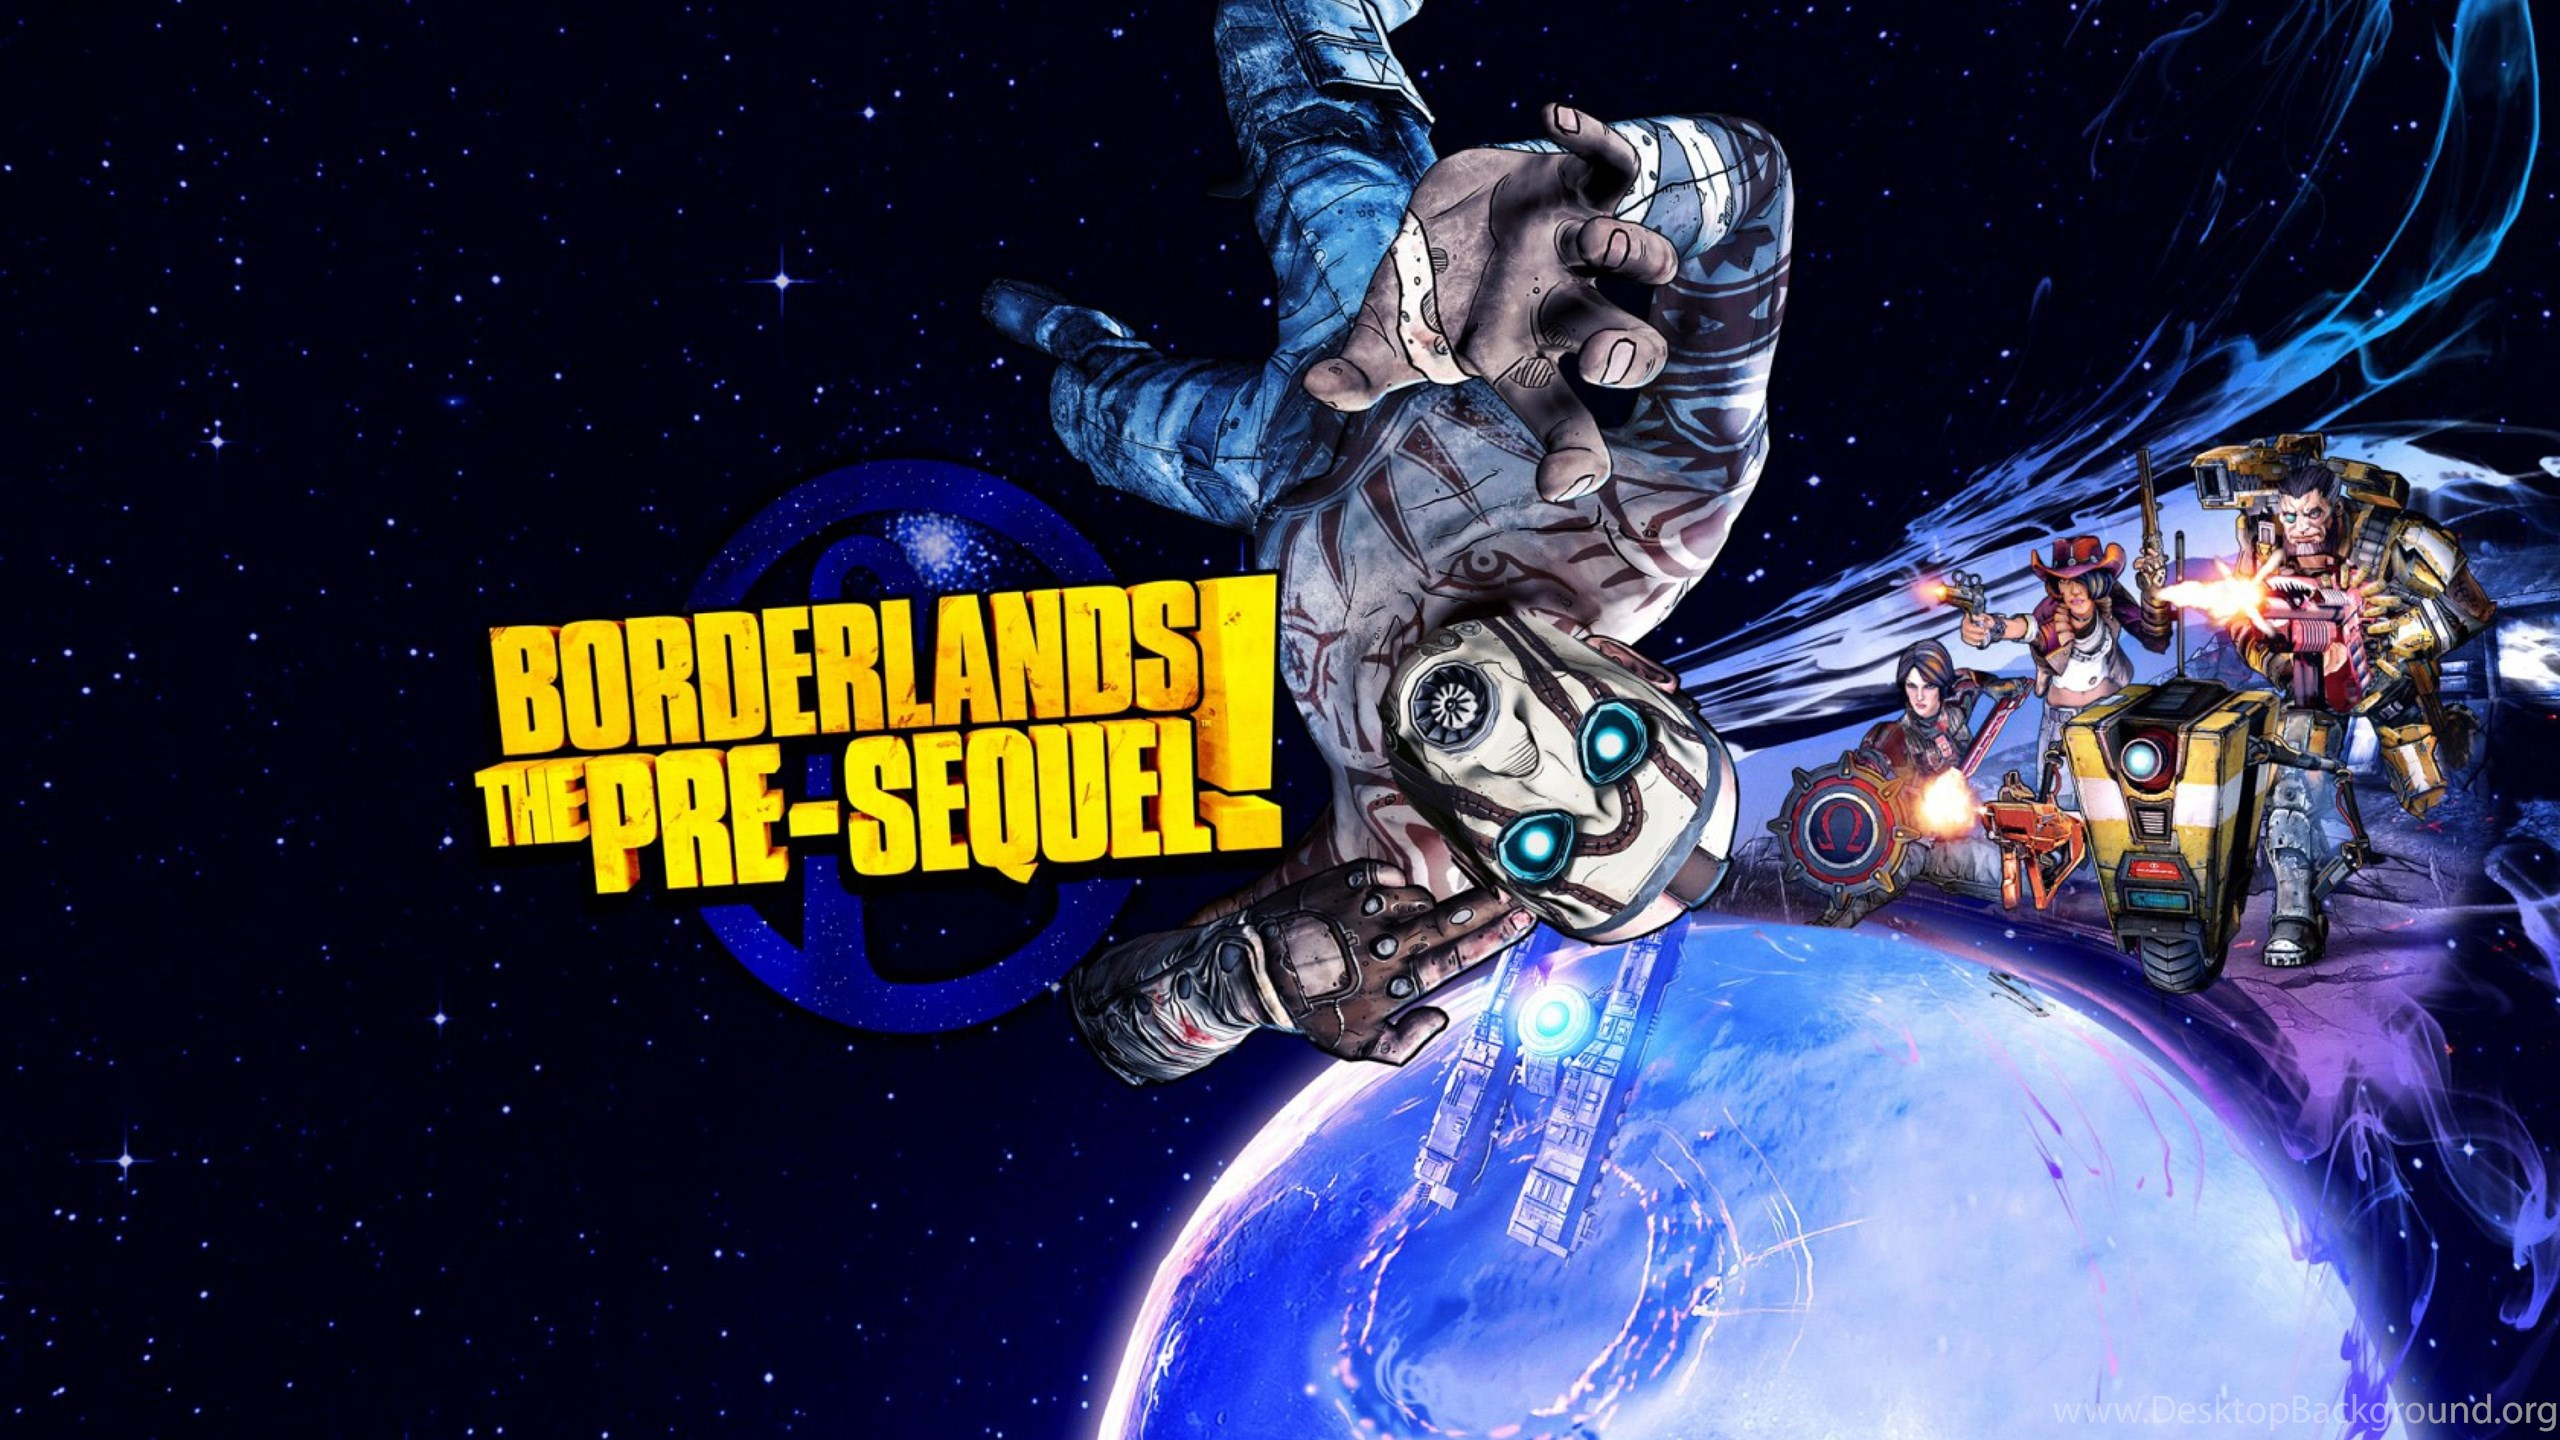 Download Wallpapers 3840x2400 Borderlands 2 Fps Rpg Unreal